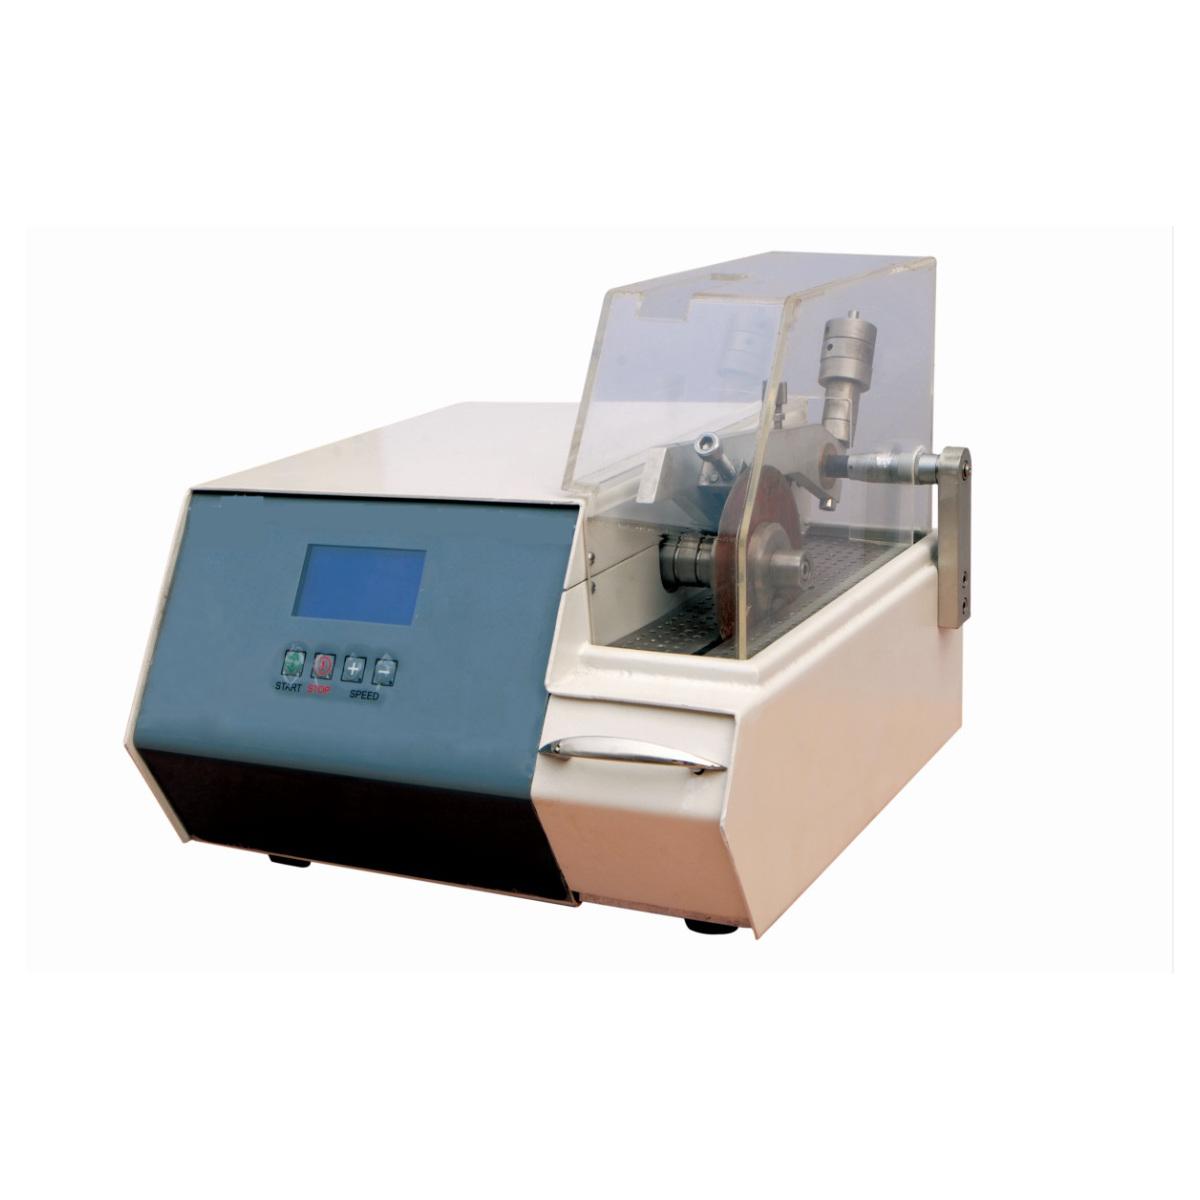 TIME®JMQ-12 Low Speed Precise Cutting